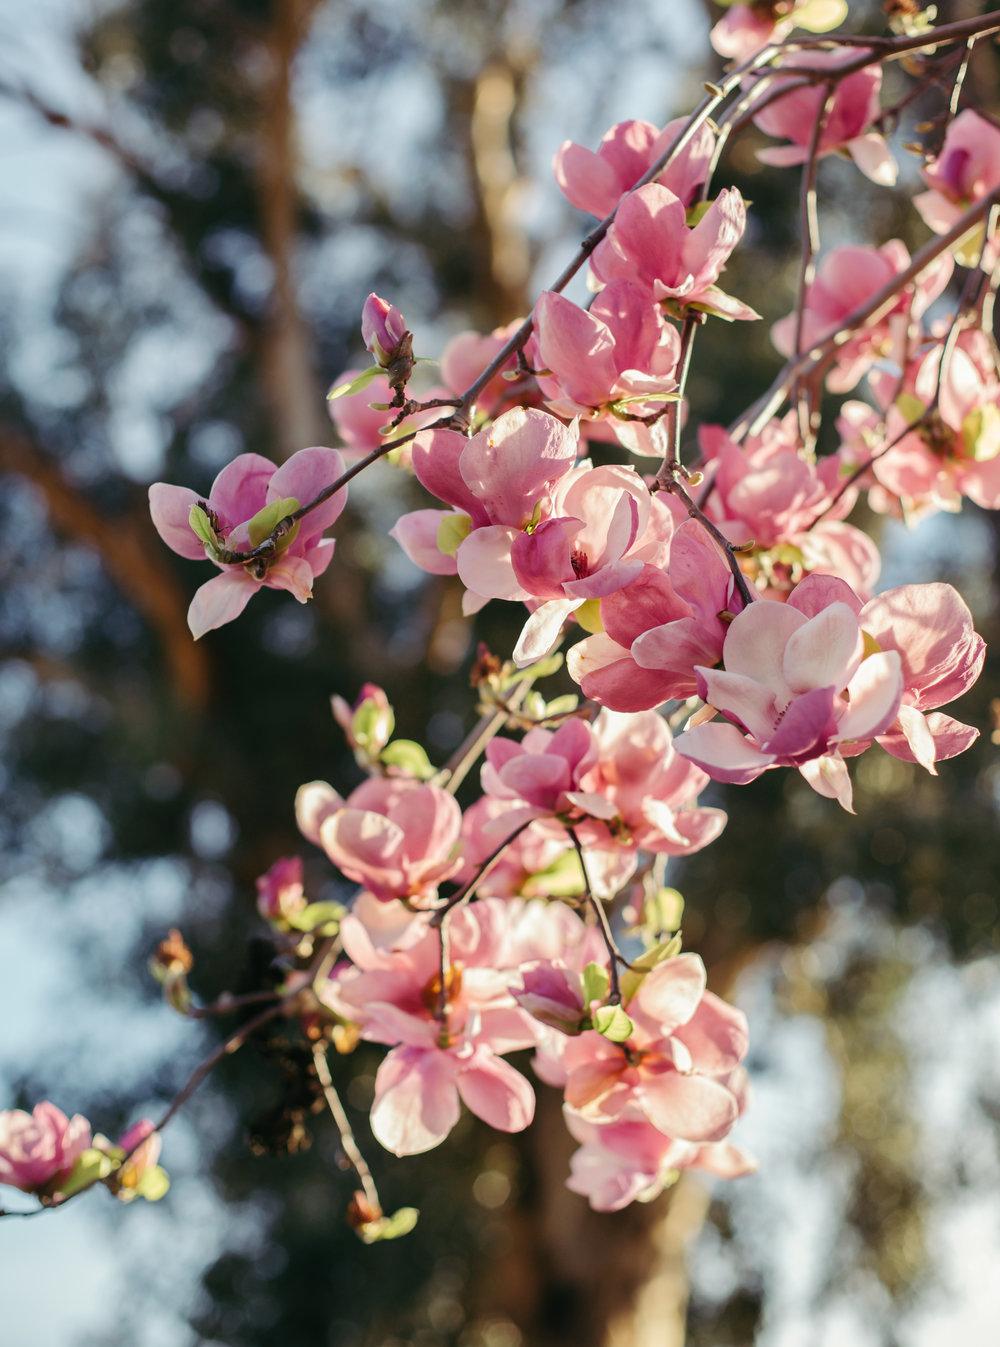 Heather Bullard | Flowering Branches